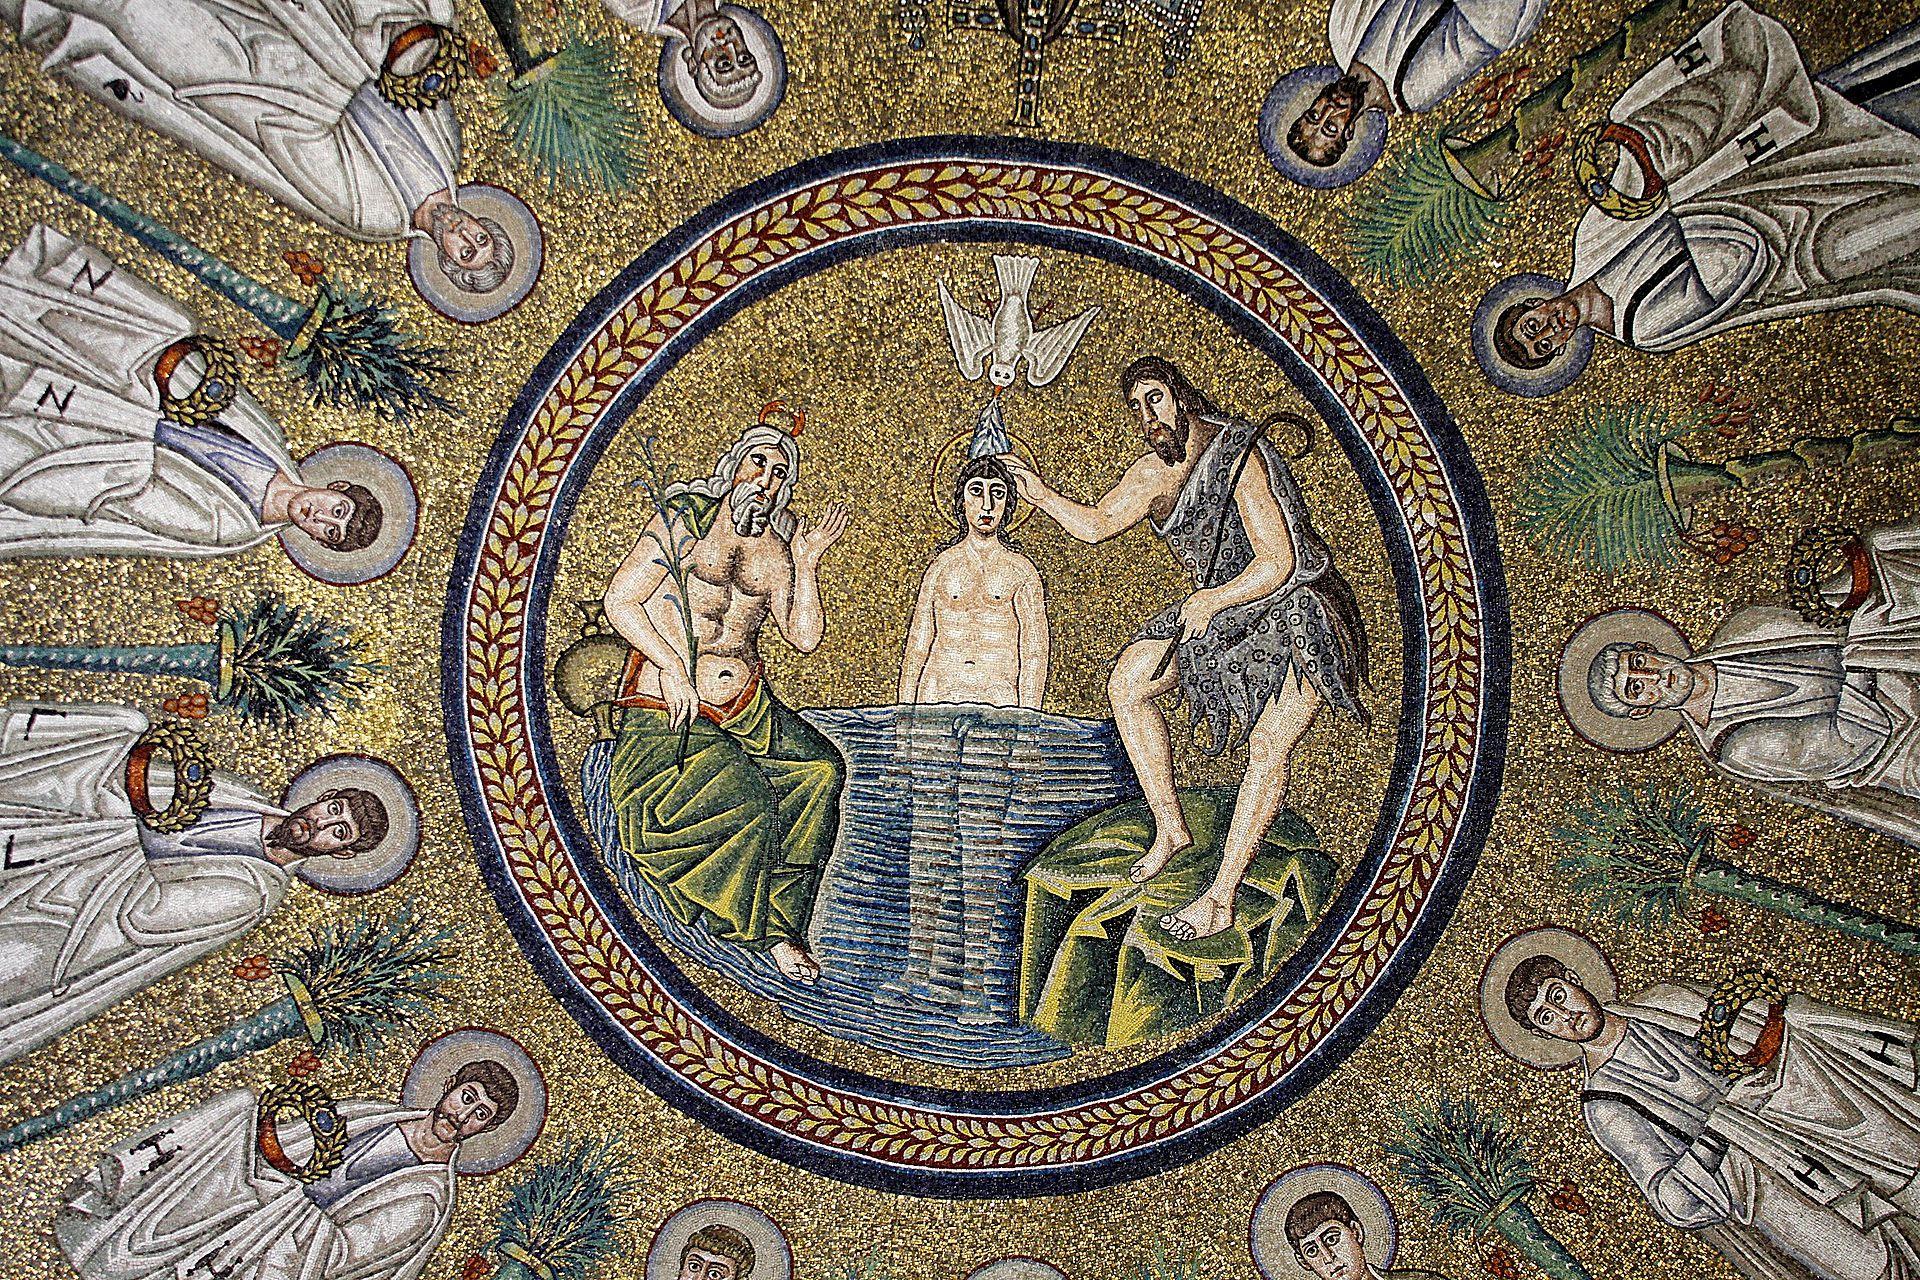 baptism_of_christ_-_arian_baptistry_-_ravenna_2016